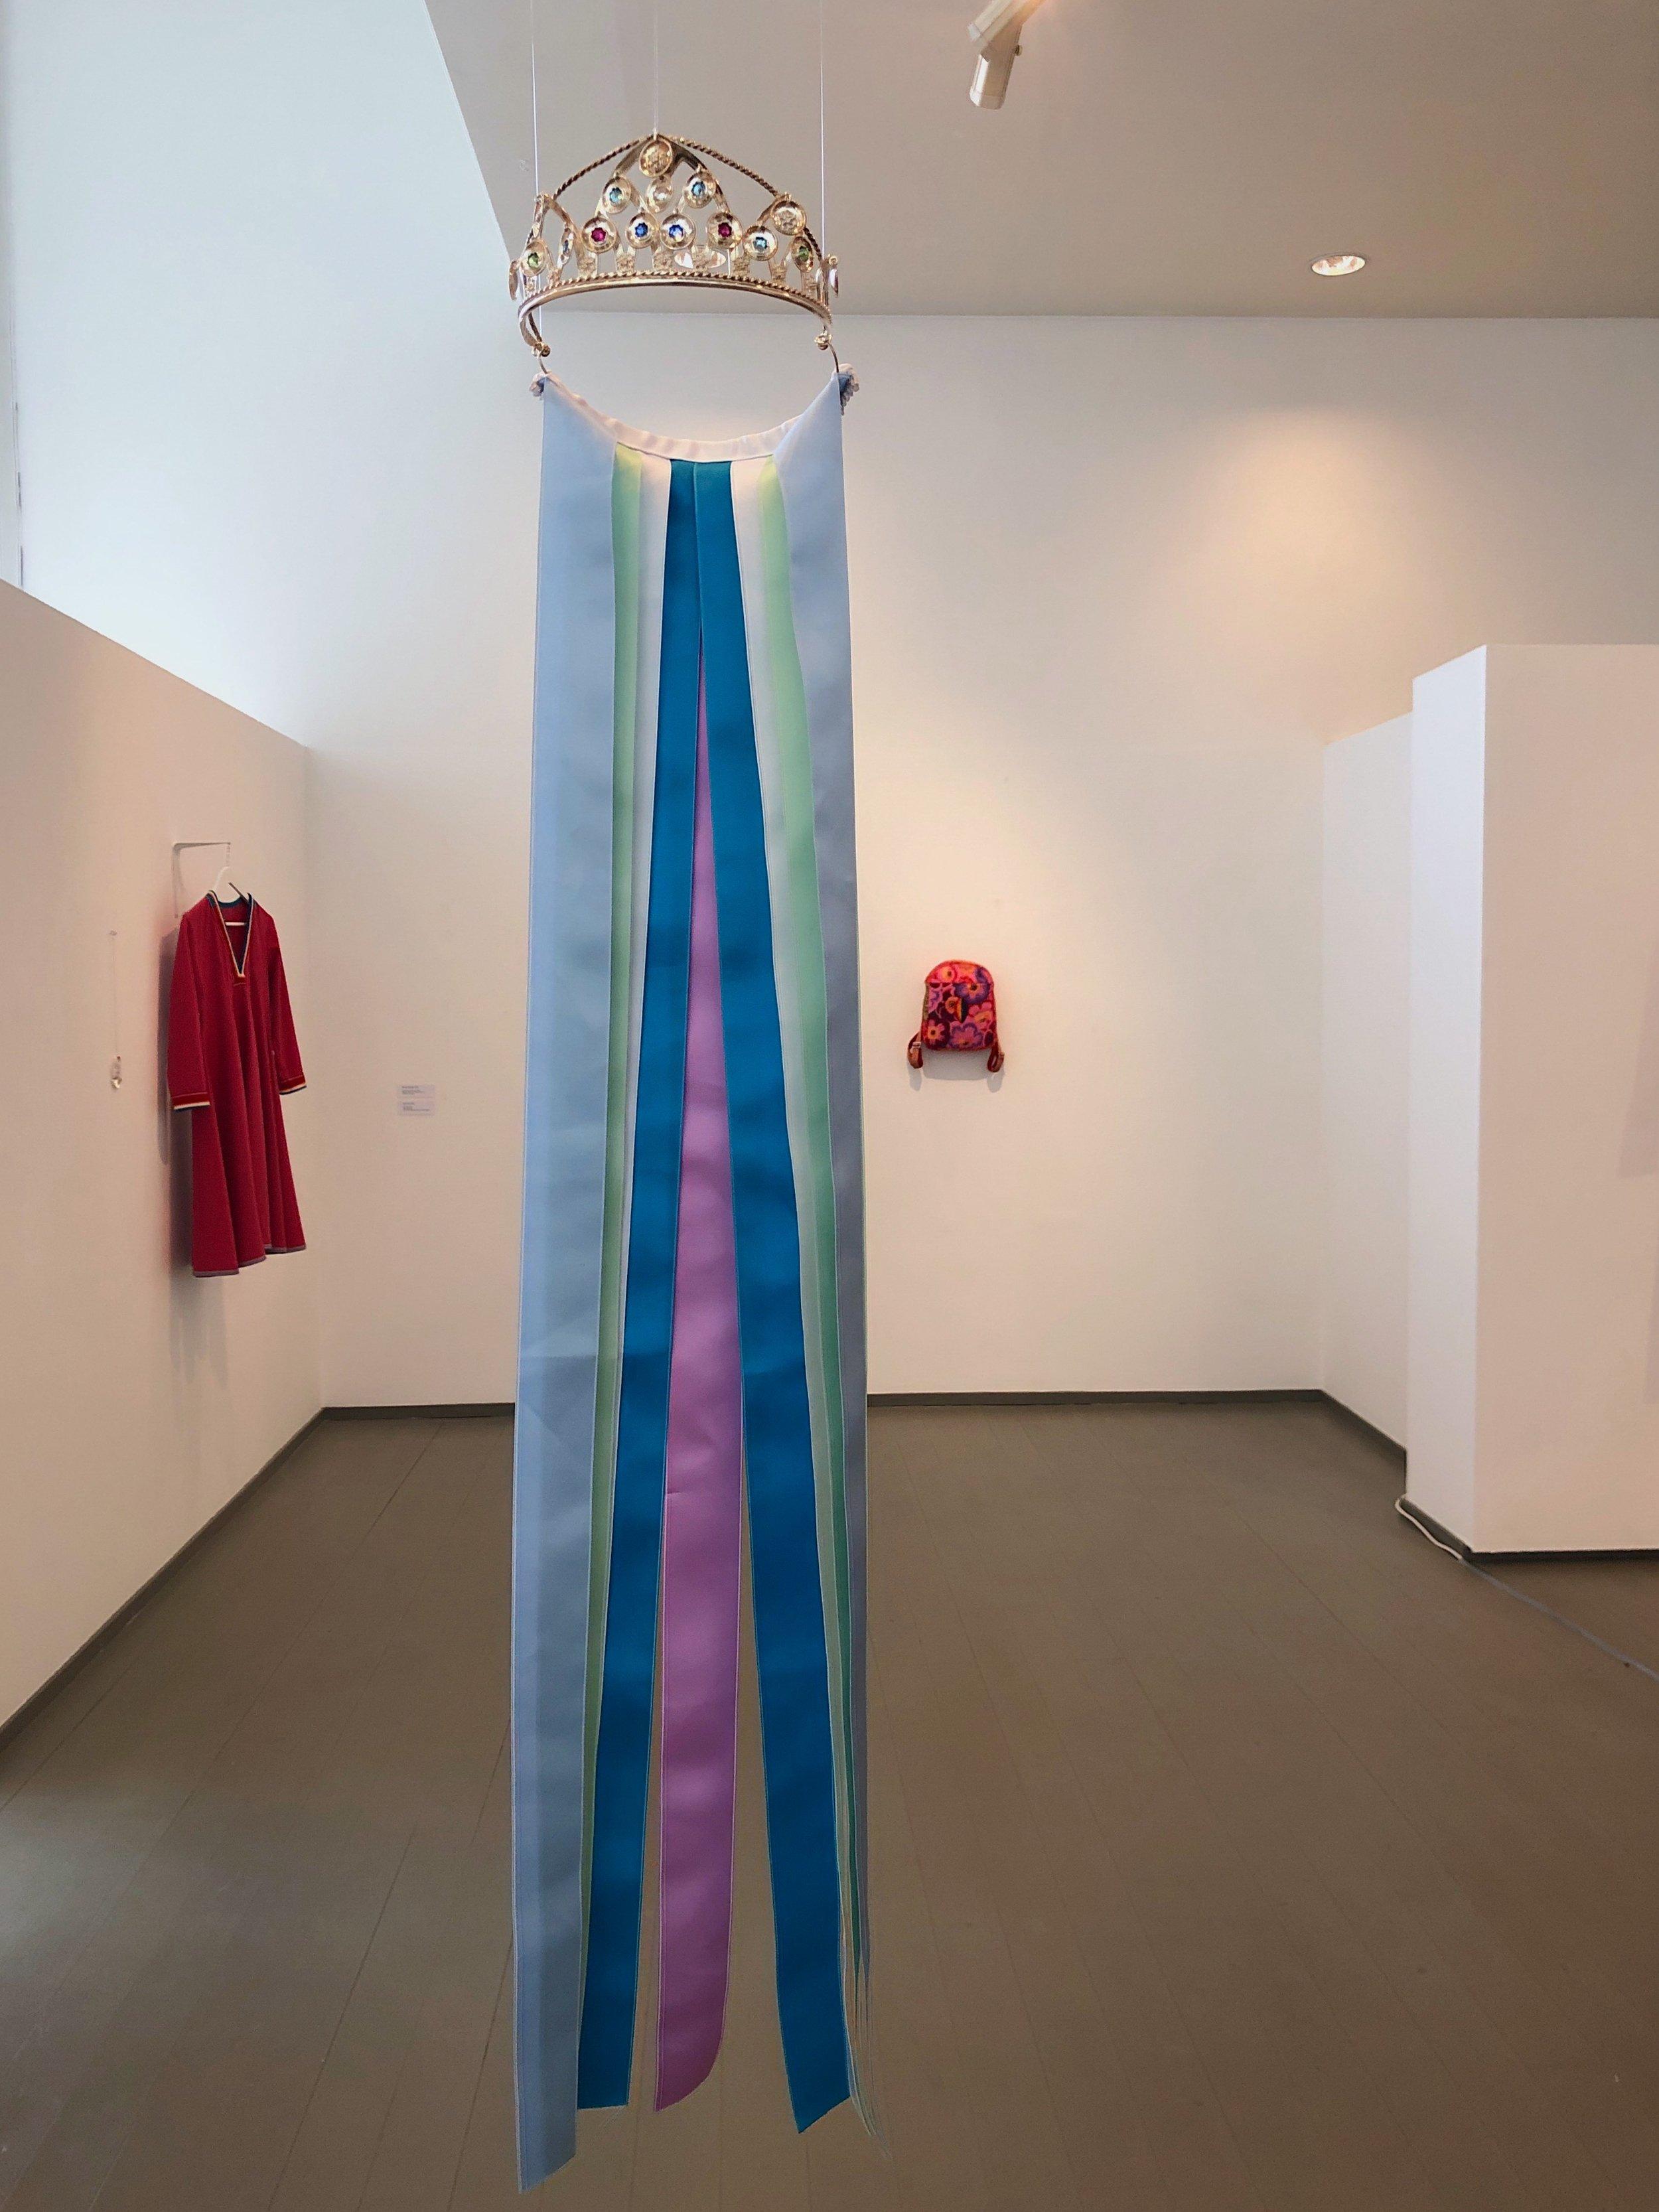 Brudekrone (2013) by Randi Marainen. Photo: Hilde Sørstrøm